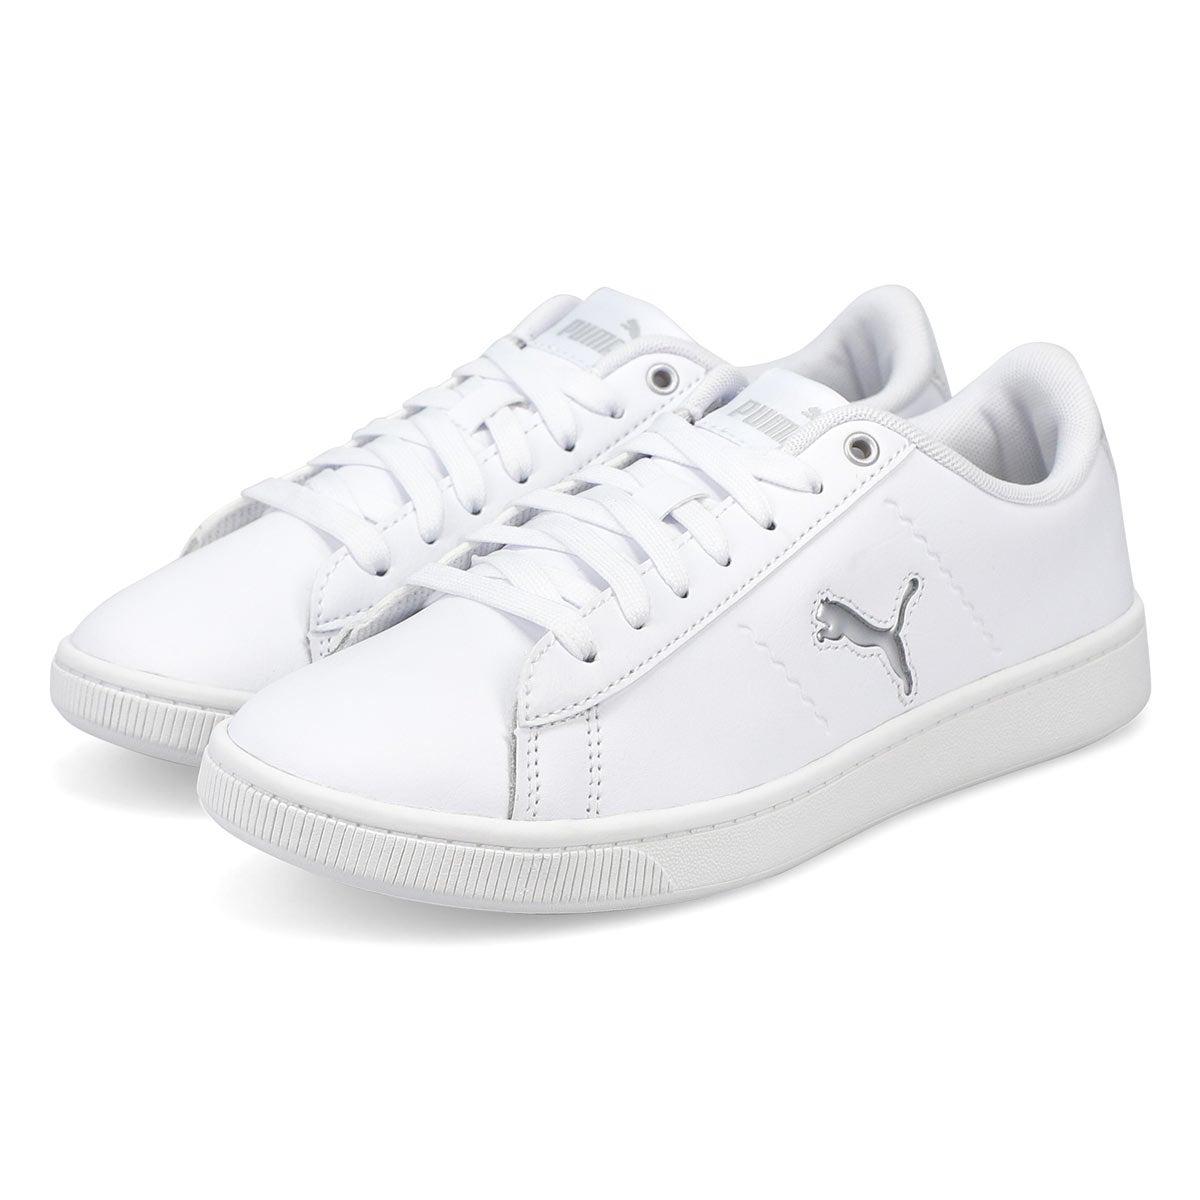 Women's Puma Vikky V2 Cat Sneaker-metallic wht/gy